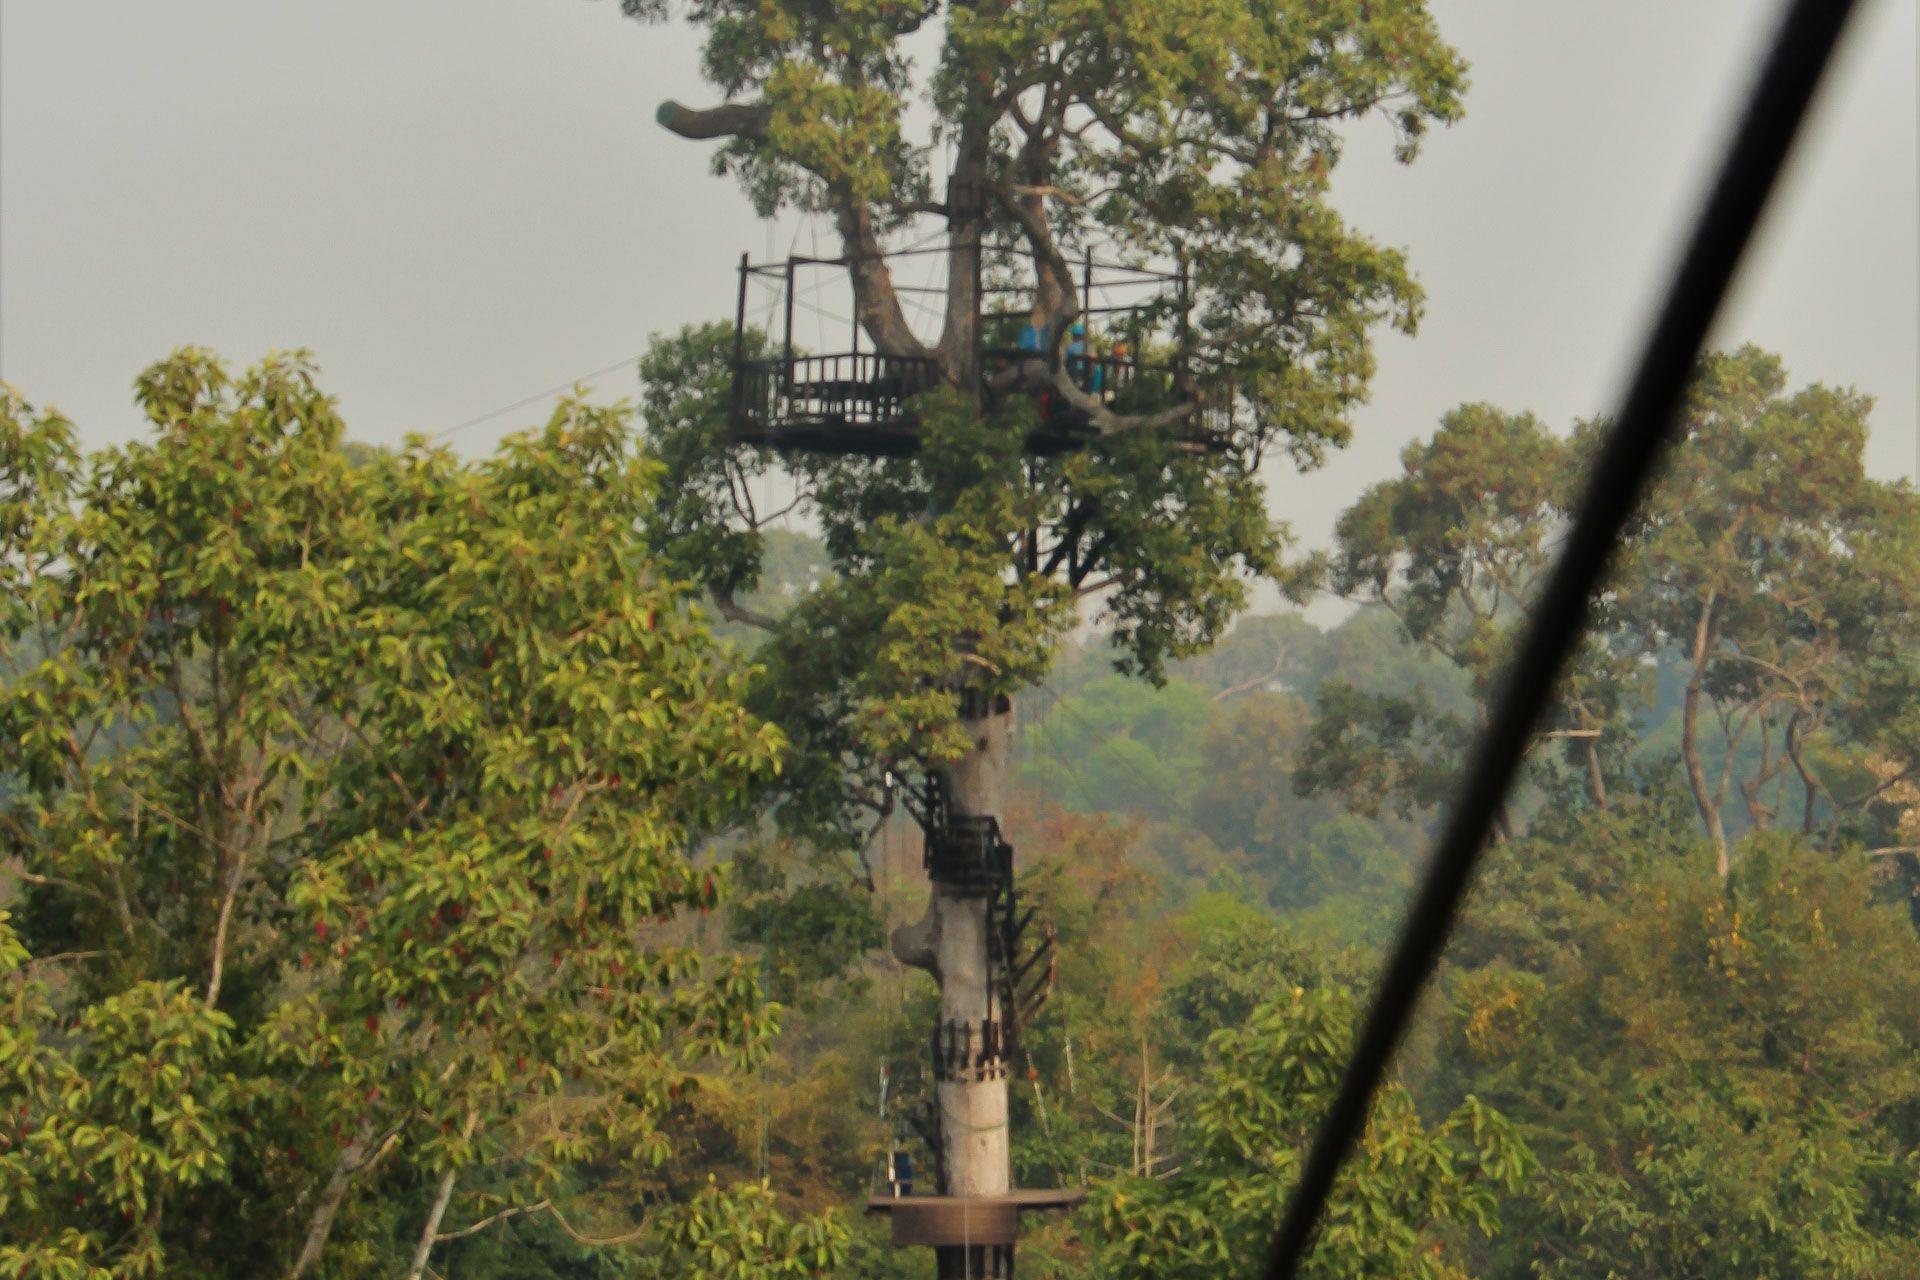 Lesvoyageuses-teste-par-les-voyageuses-tyrolienne-siem-reap-cambodge-angkor-zipline-5